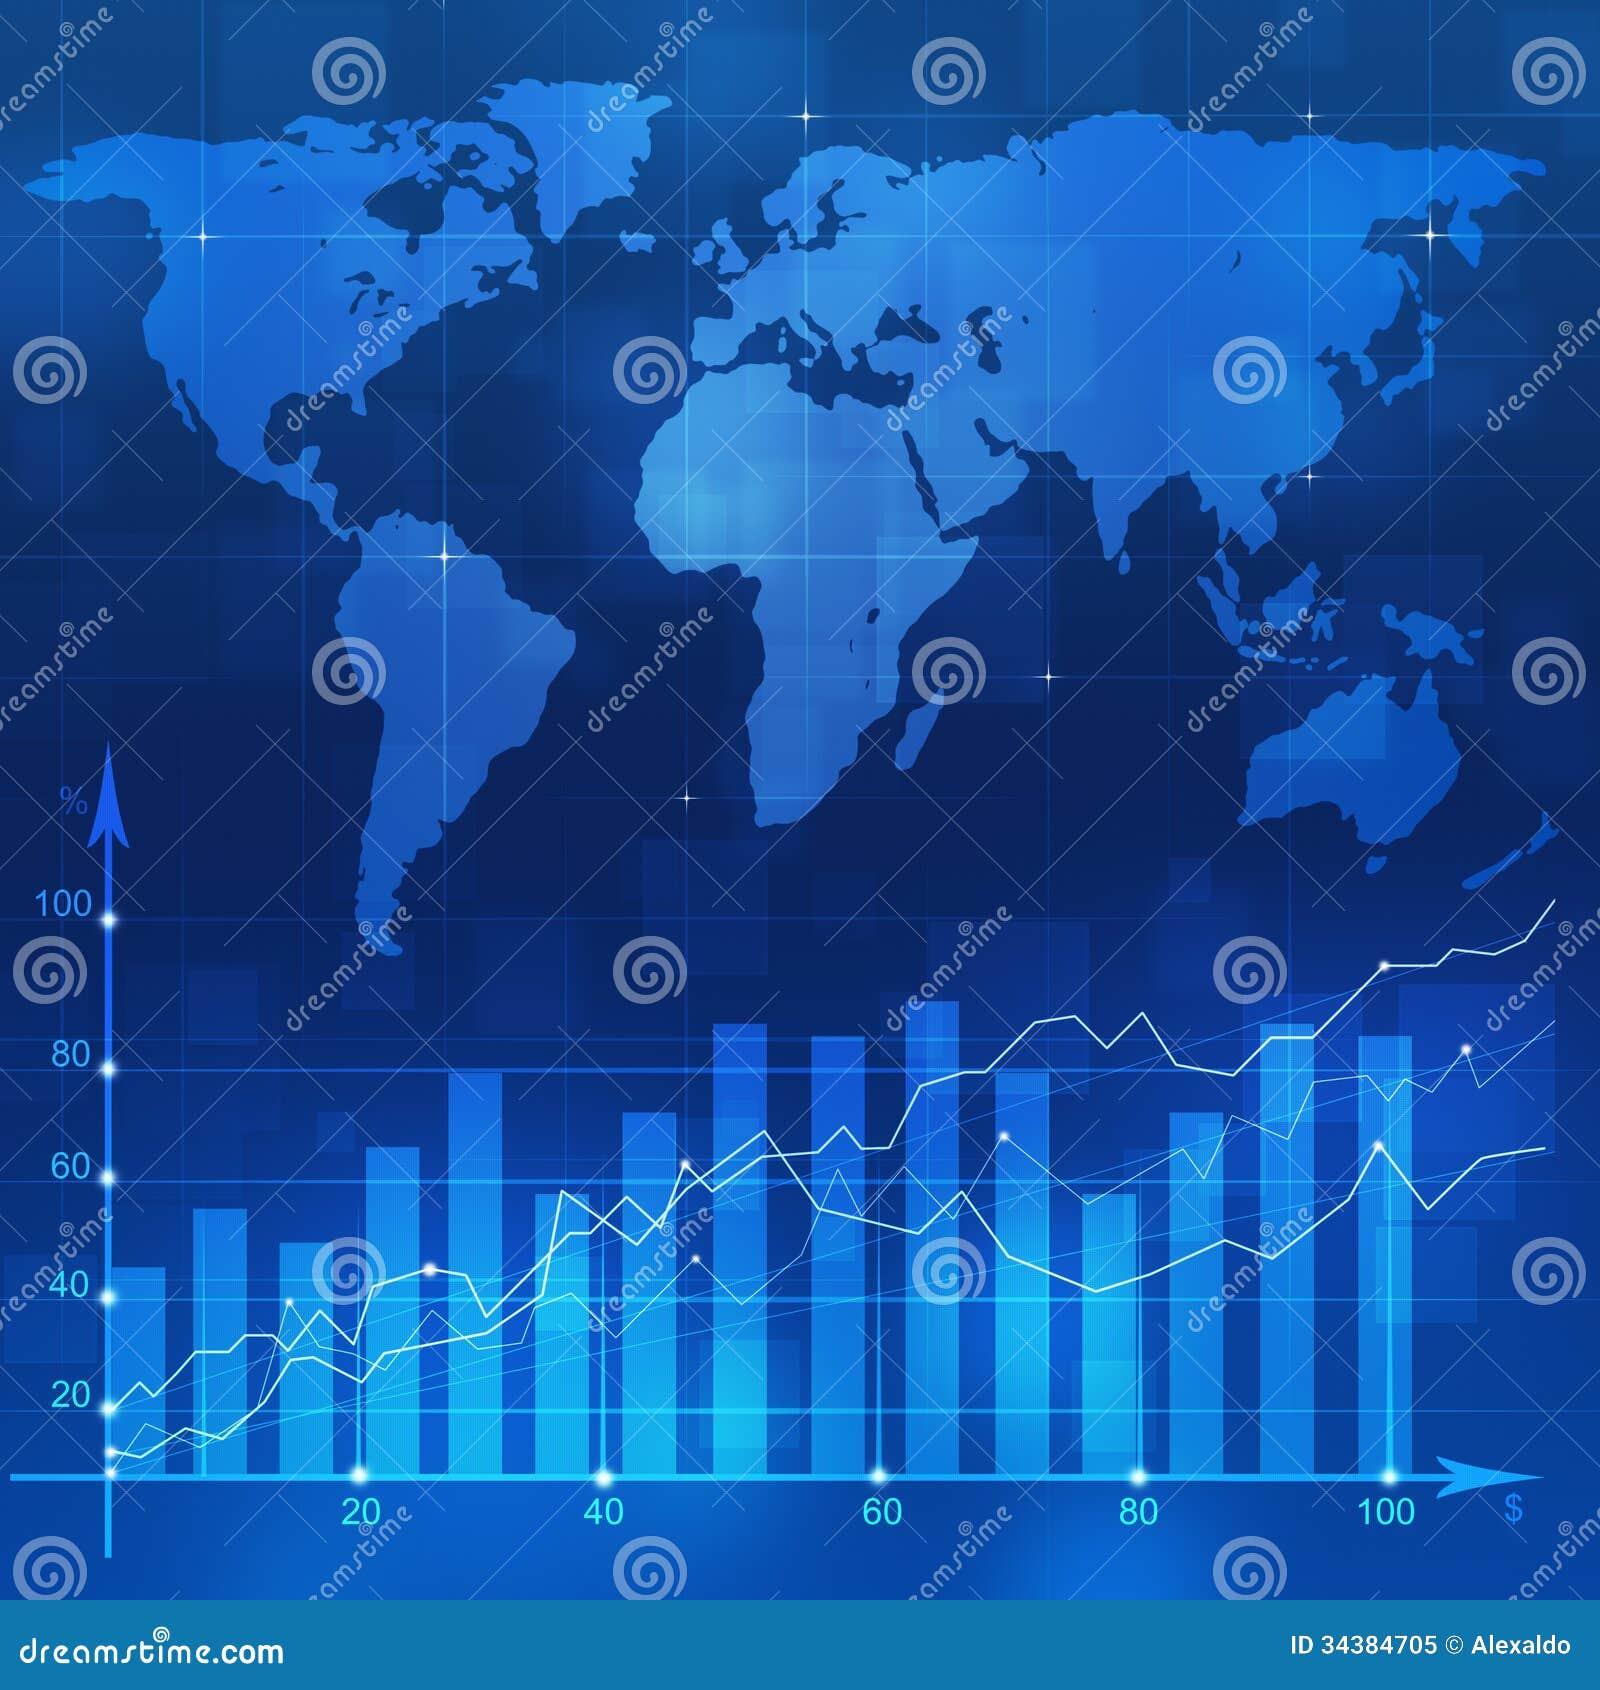 Finance Background: Stock Diagram Blue Backgorund Royalty Free Stock Photo